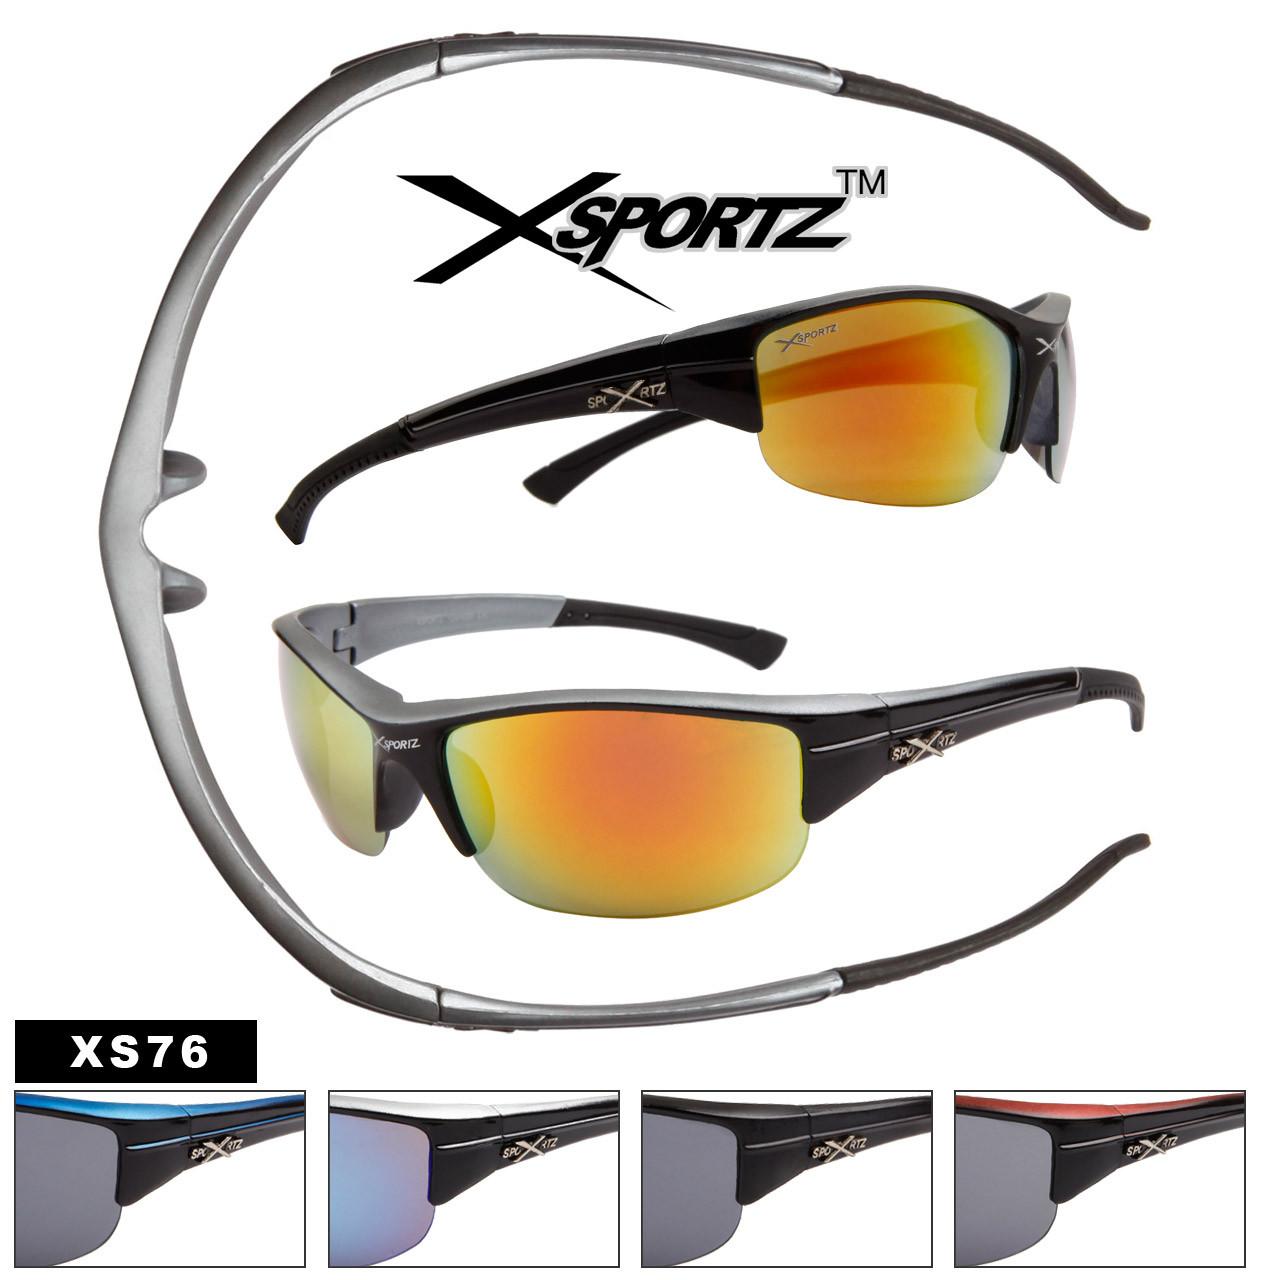 Xsportz™ Men's Sports Sunglasses Wholesale - Style # XS76